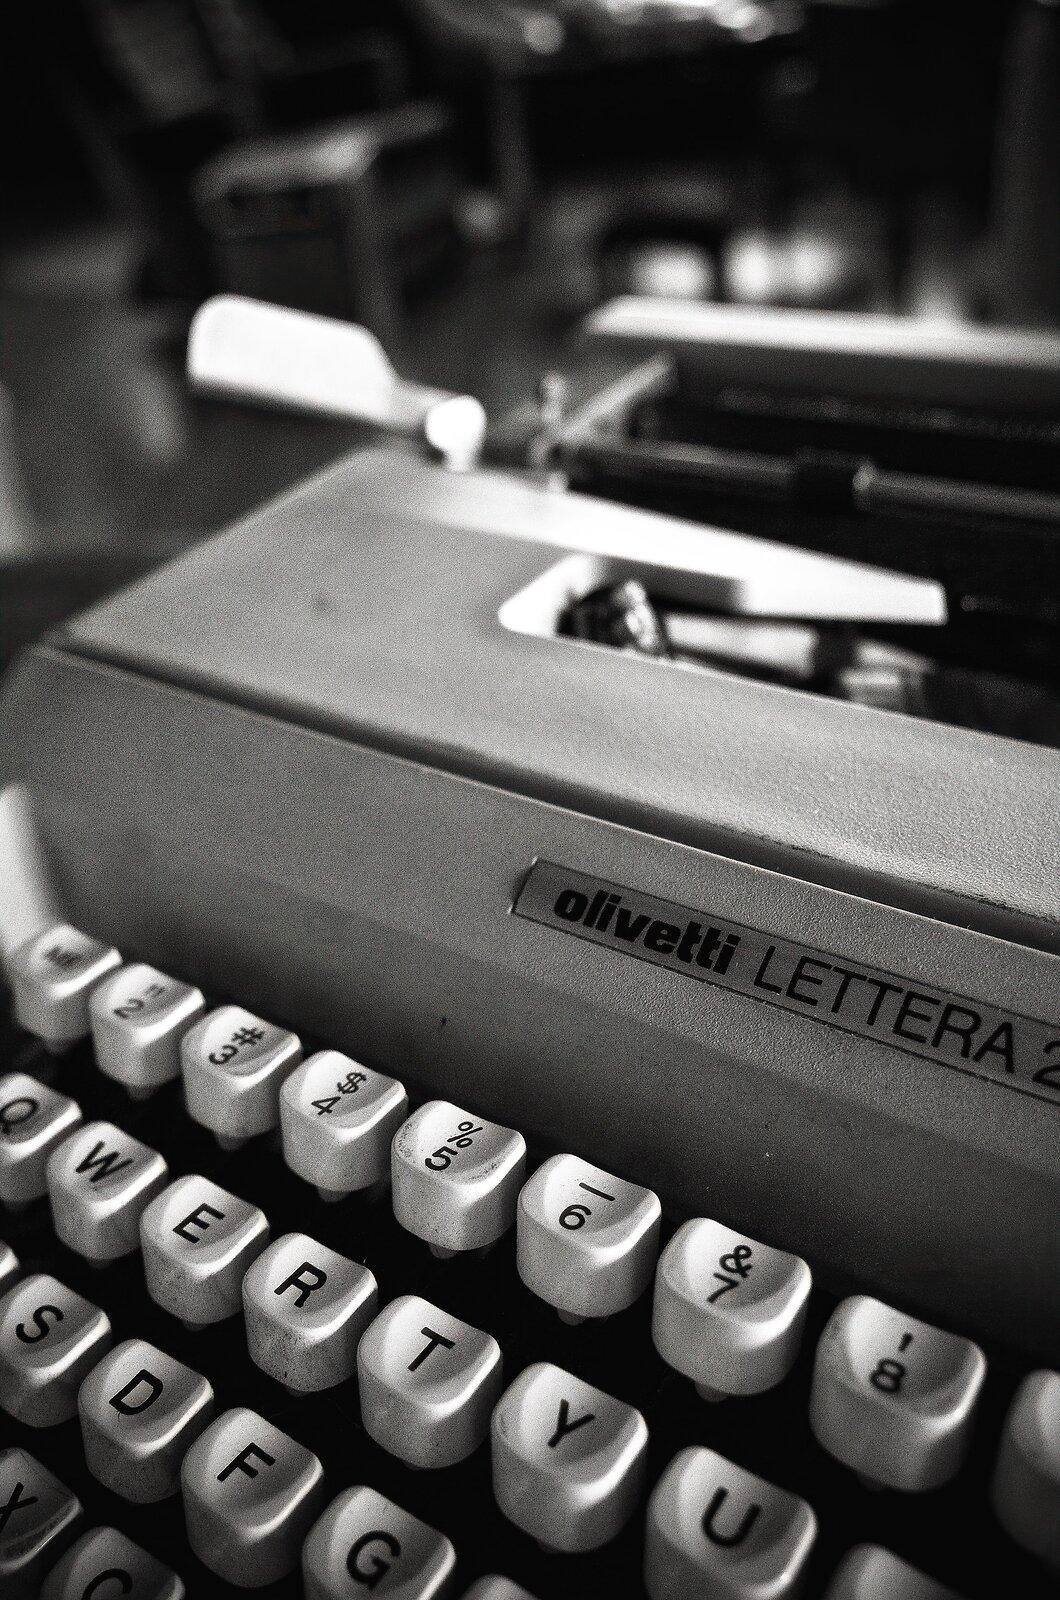 GRII_May8_Olivetti_Lettera(monochrome).jpg